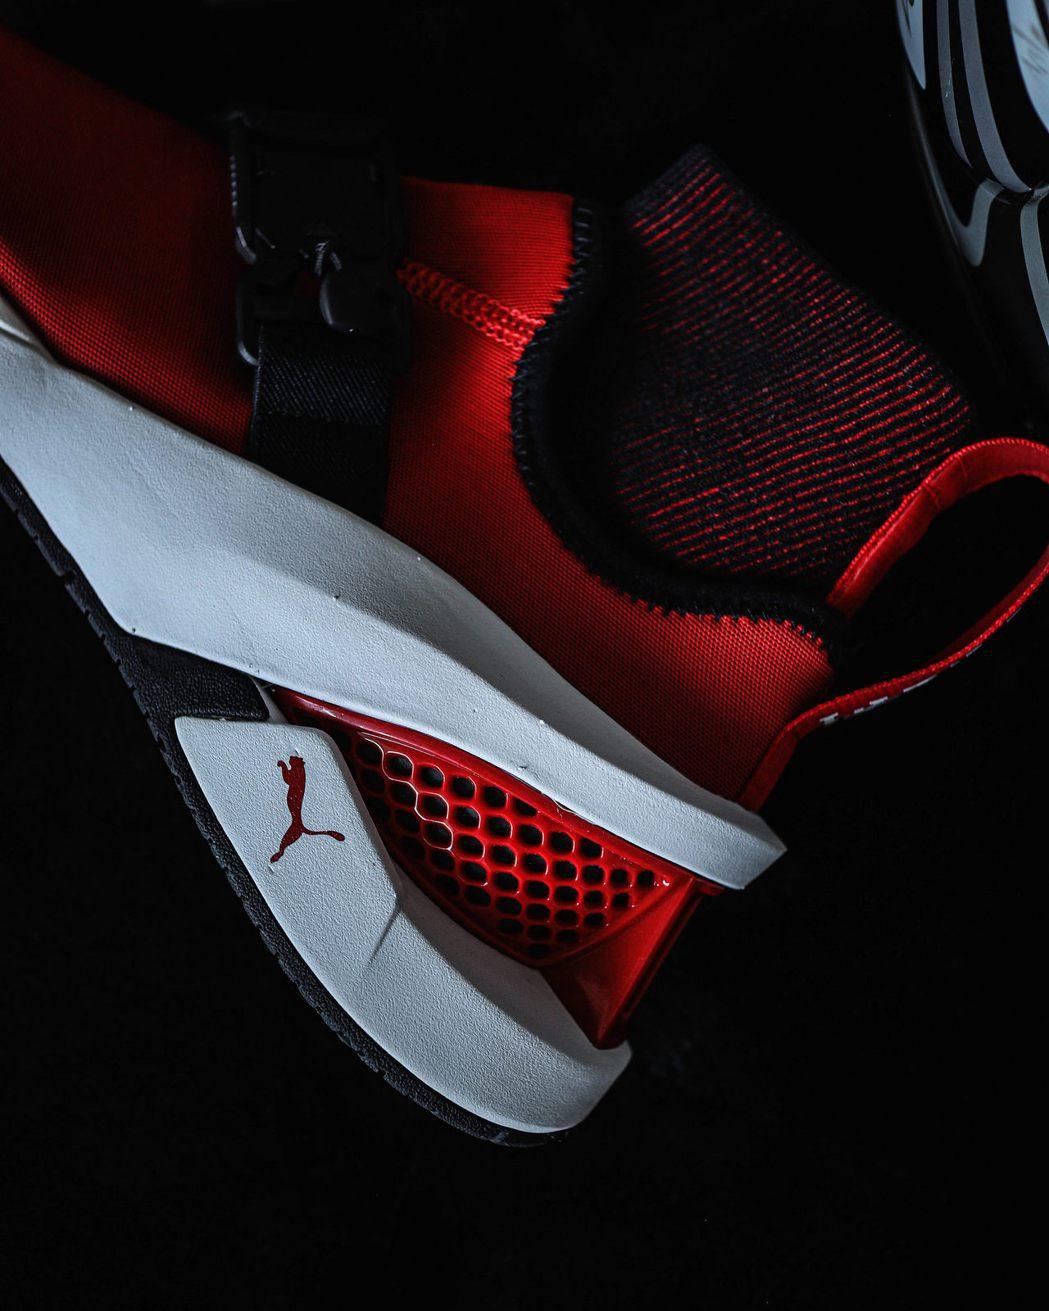 Puma與Ferrari推出聯名超炫鞋款ION F。 圖/Puma提供